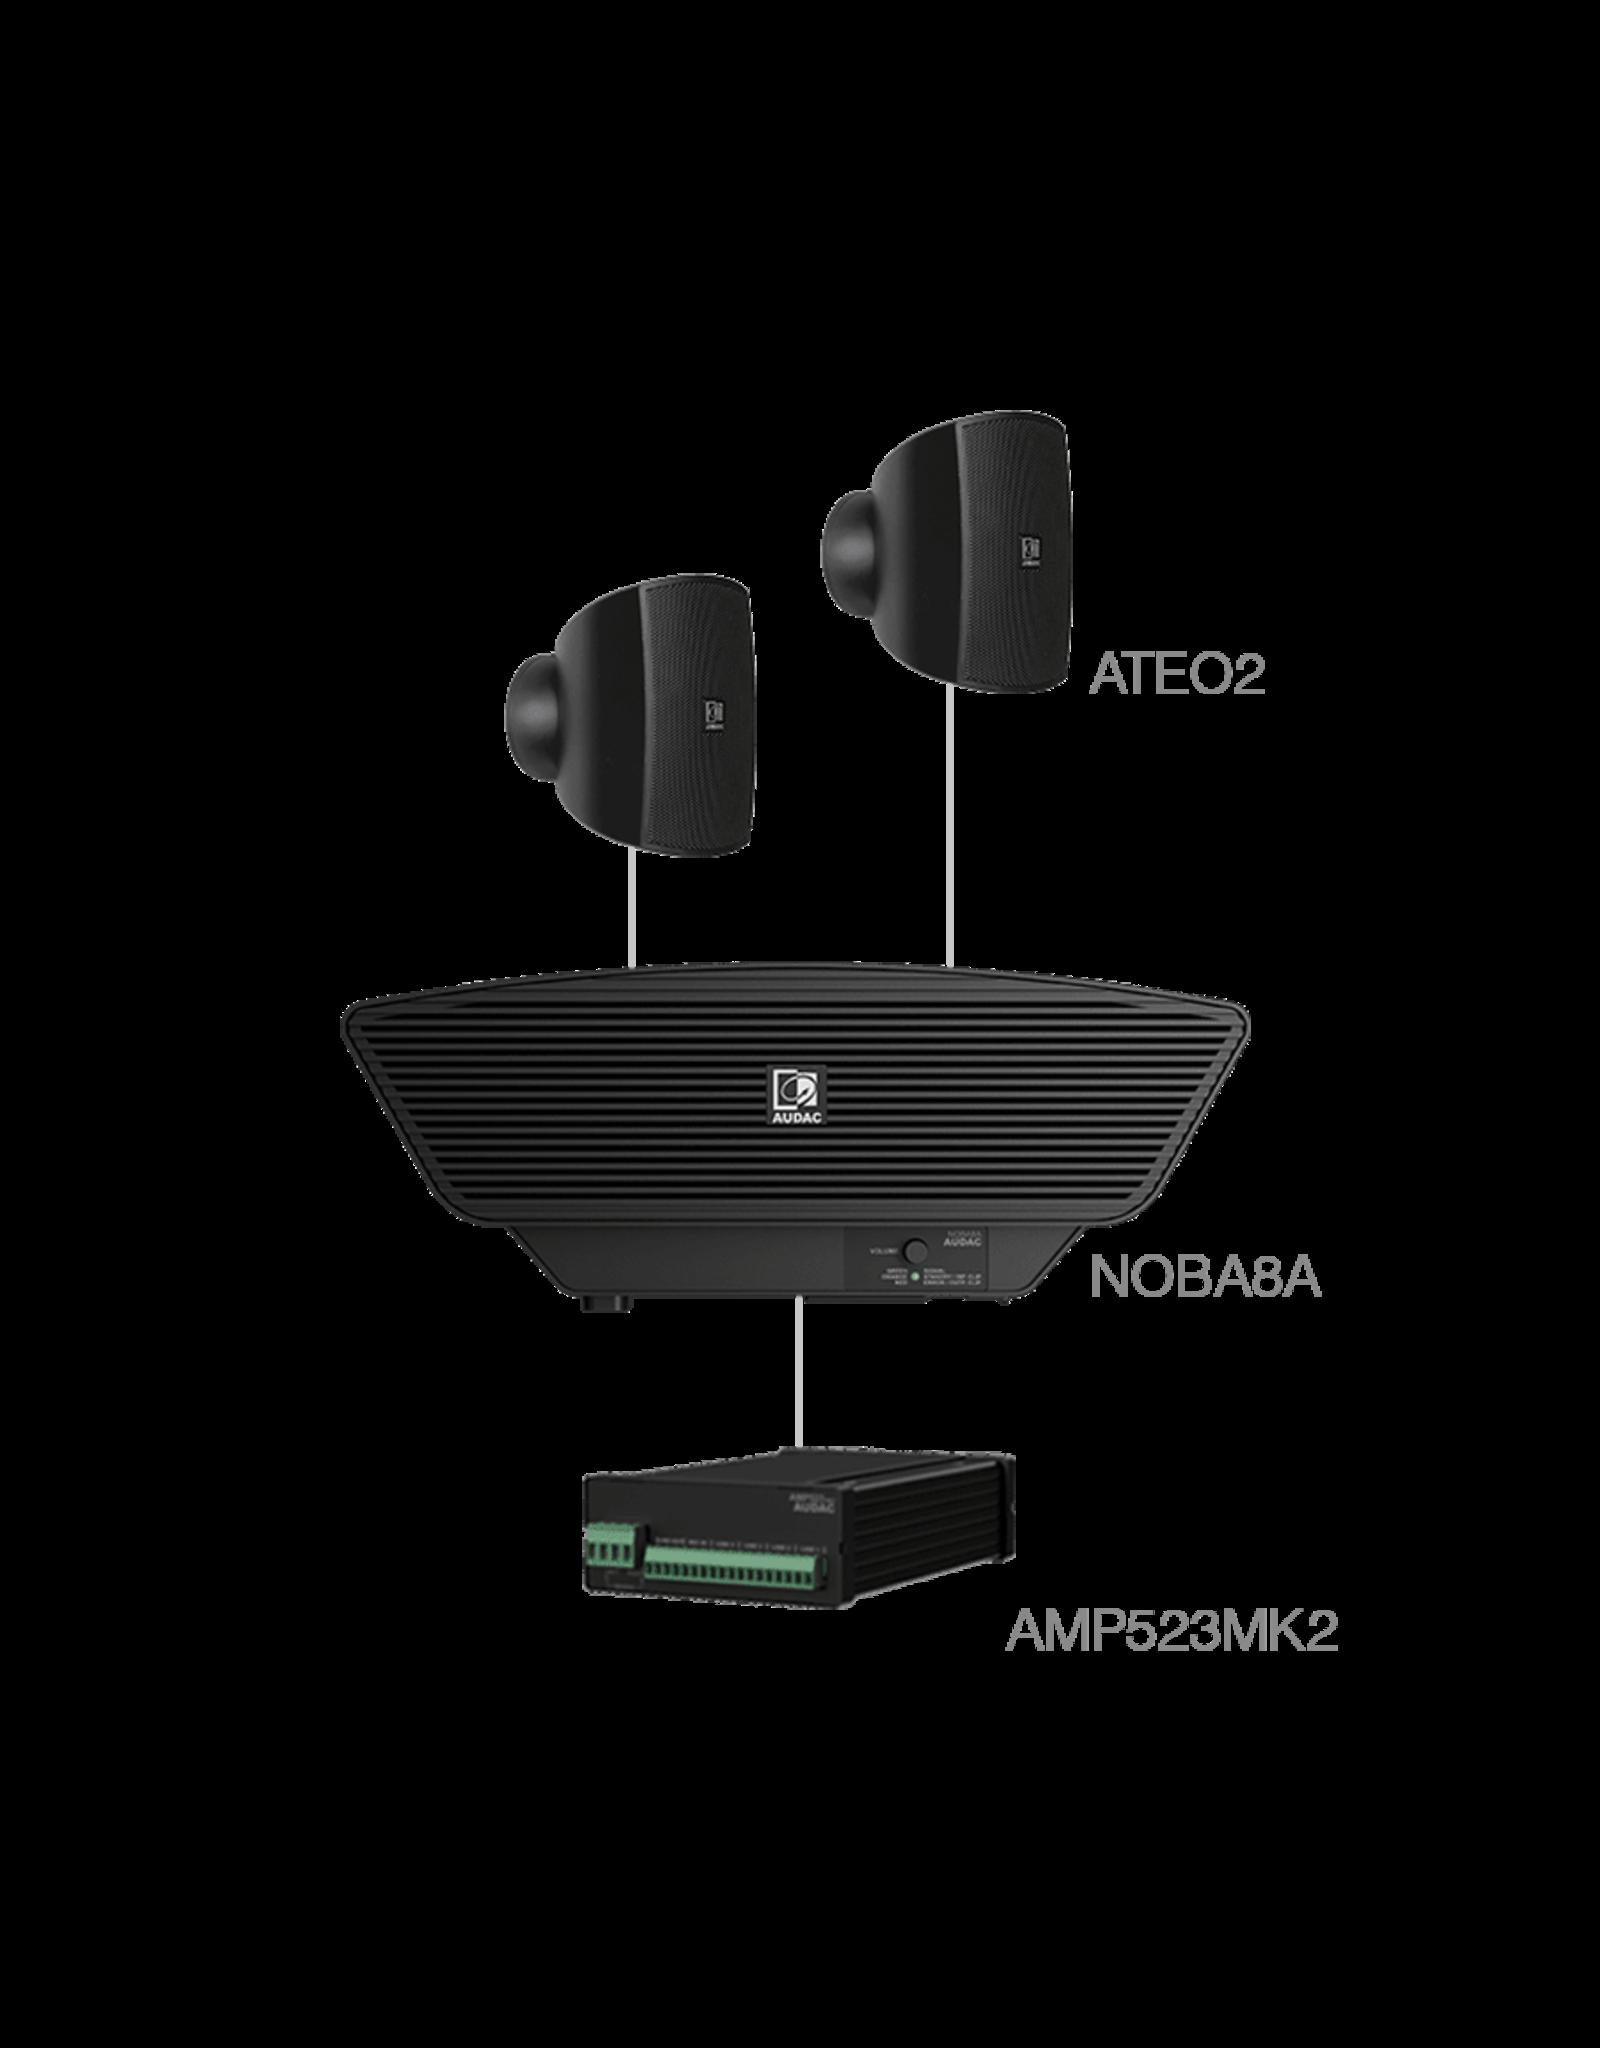 Audac 2x ATEO2 + NOBA8A + AMP523MK2 Black